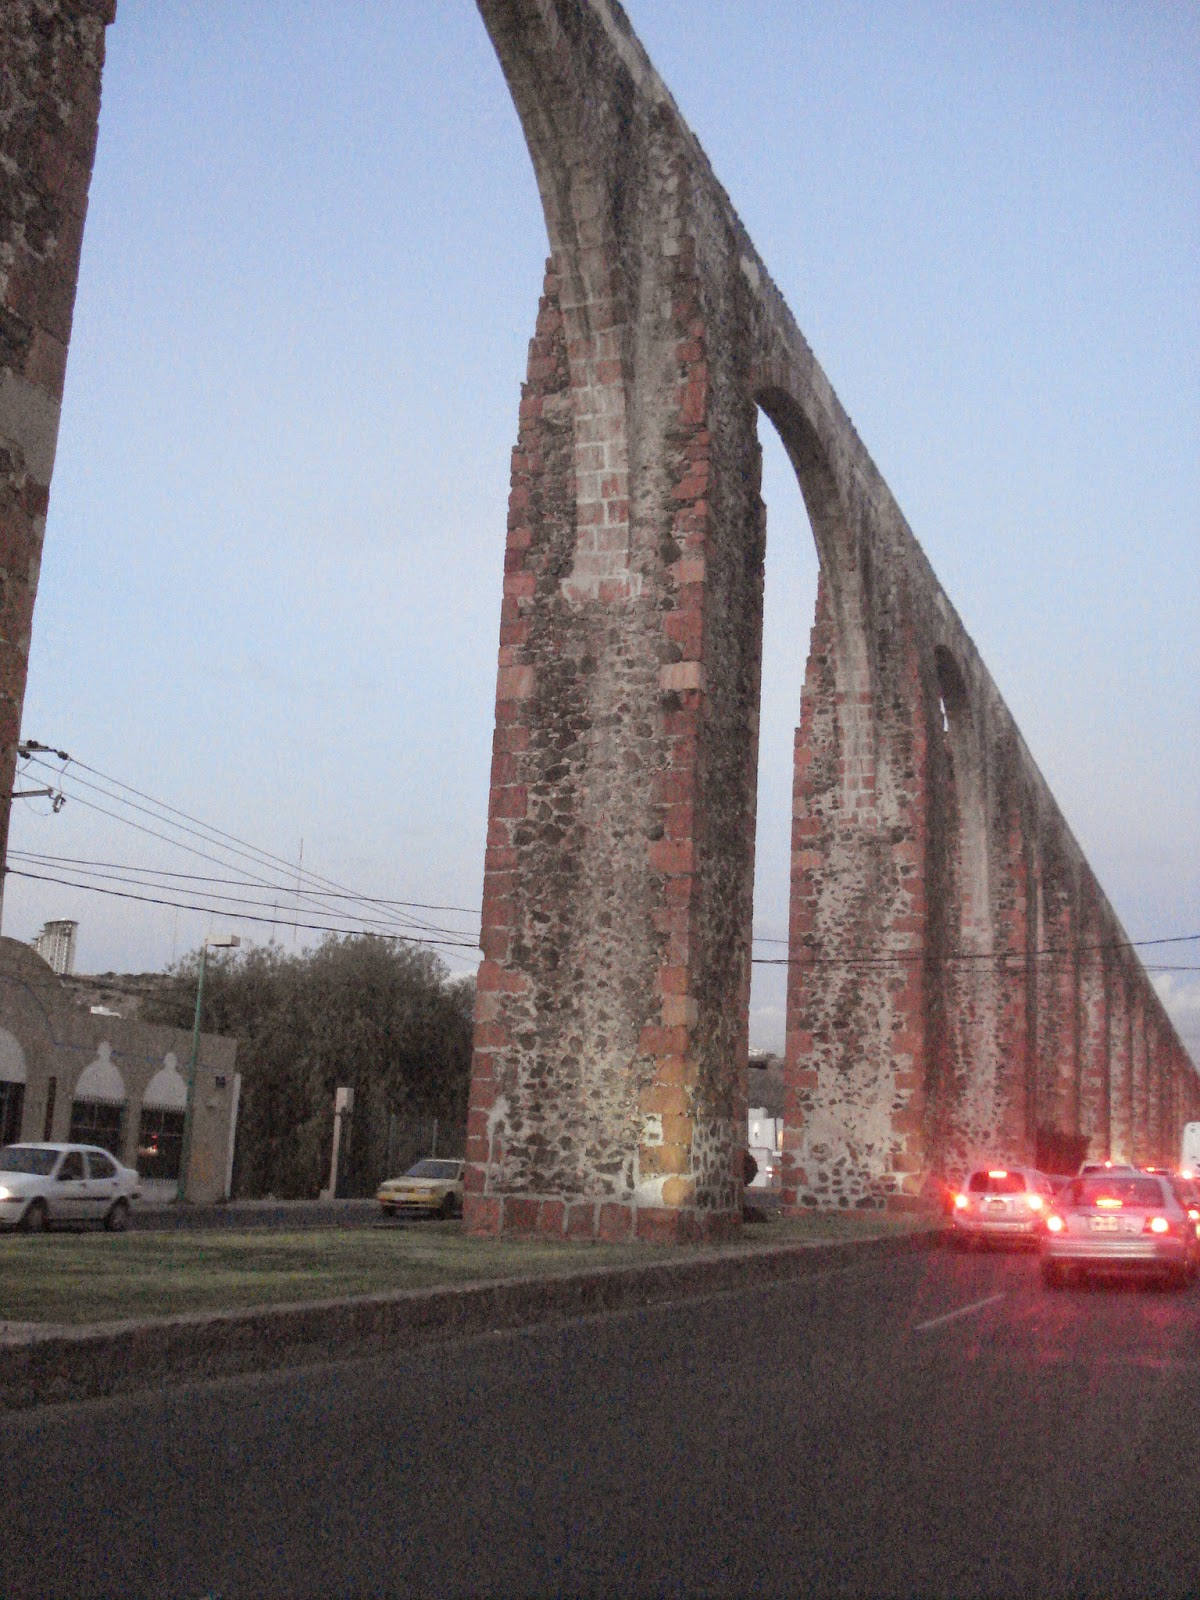 Road of faith and art camino del arte sacro back to mexico to colonial queretaro the city of fountains